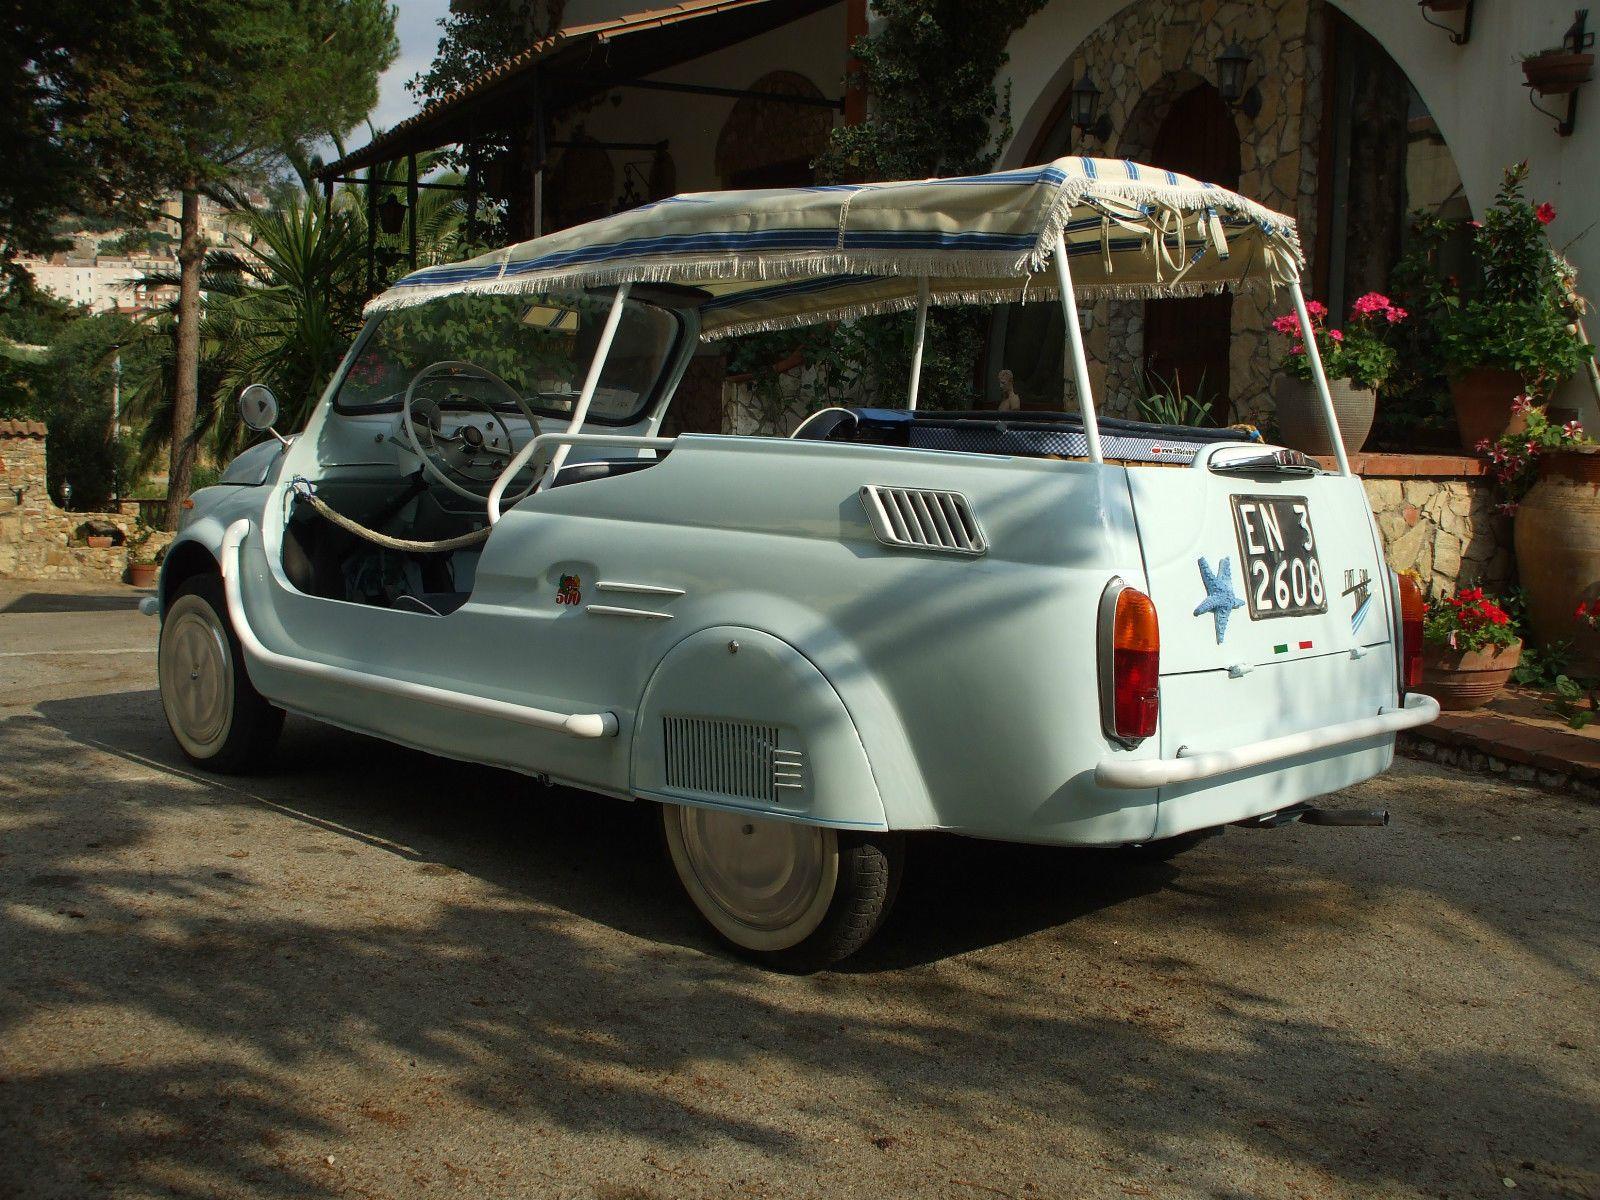 71 Fiat 120 Nuova 500 Giardiniera Spiaggina Jolly With Images